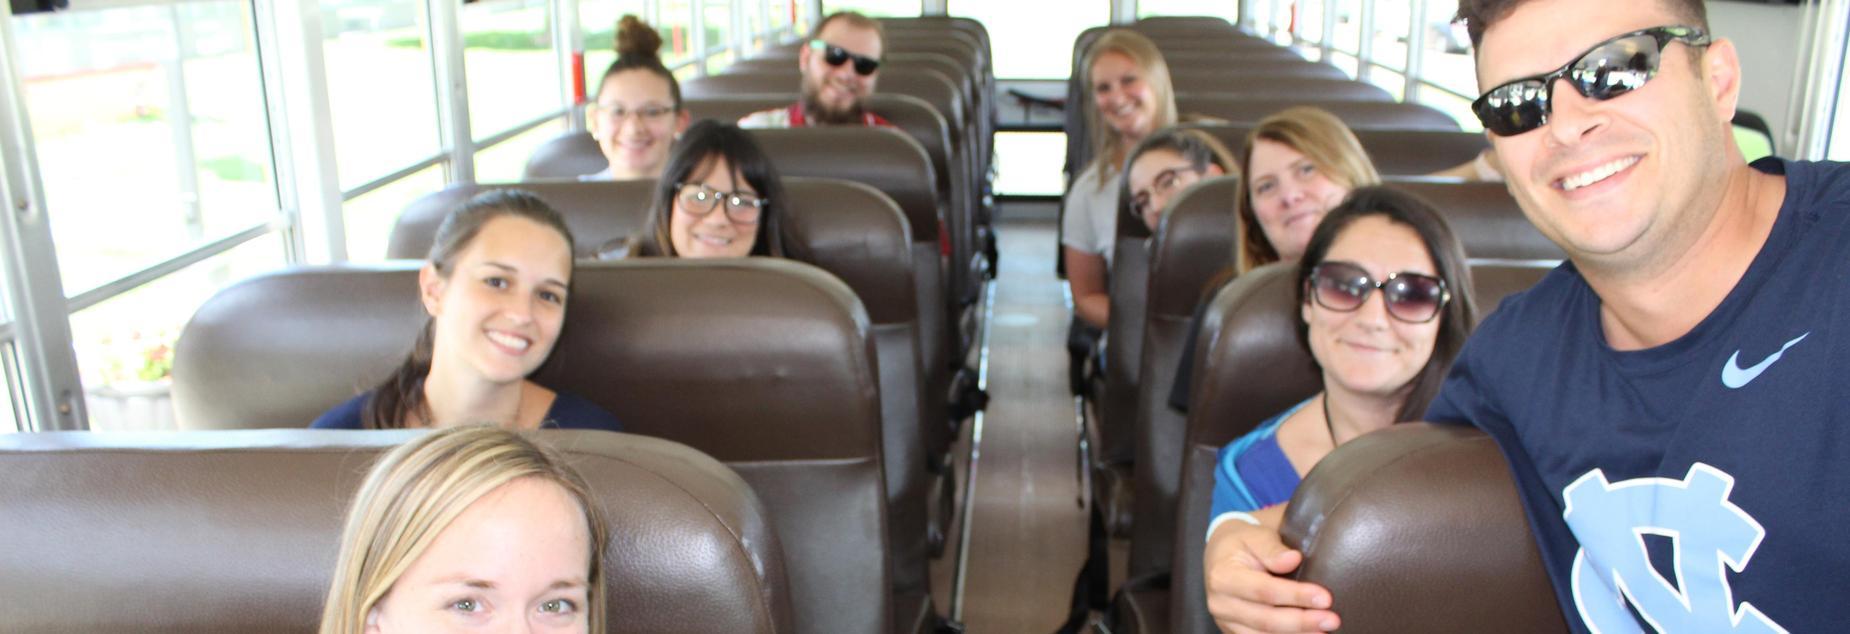 new staff bus ride